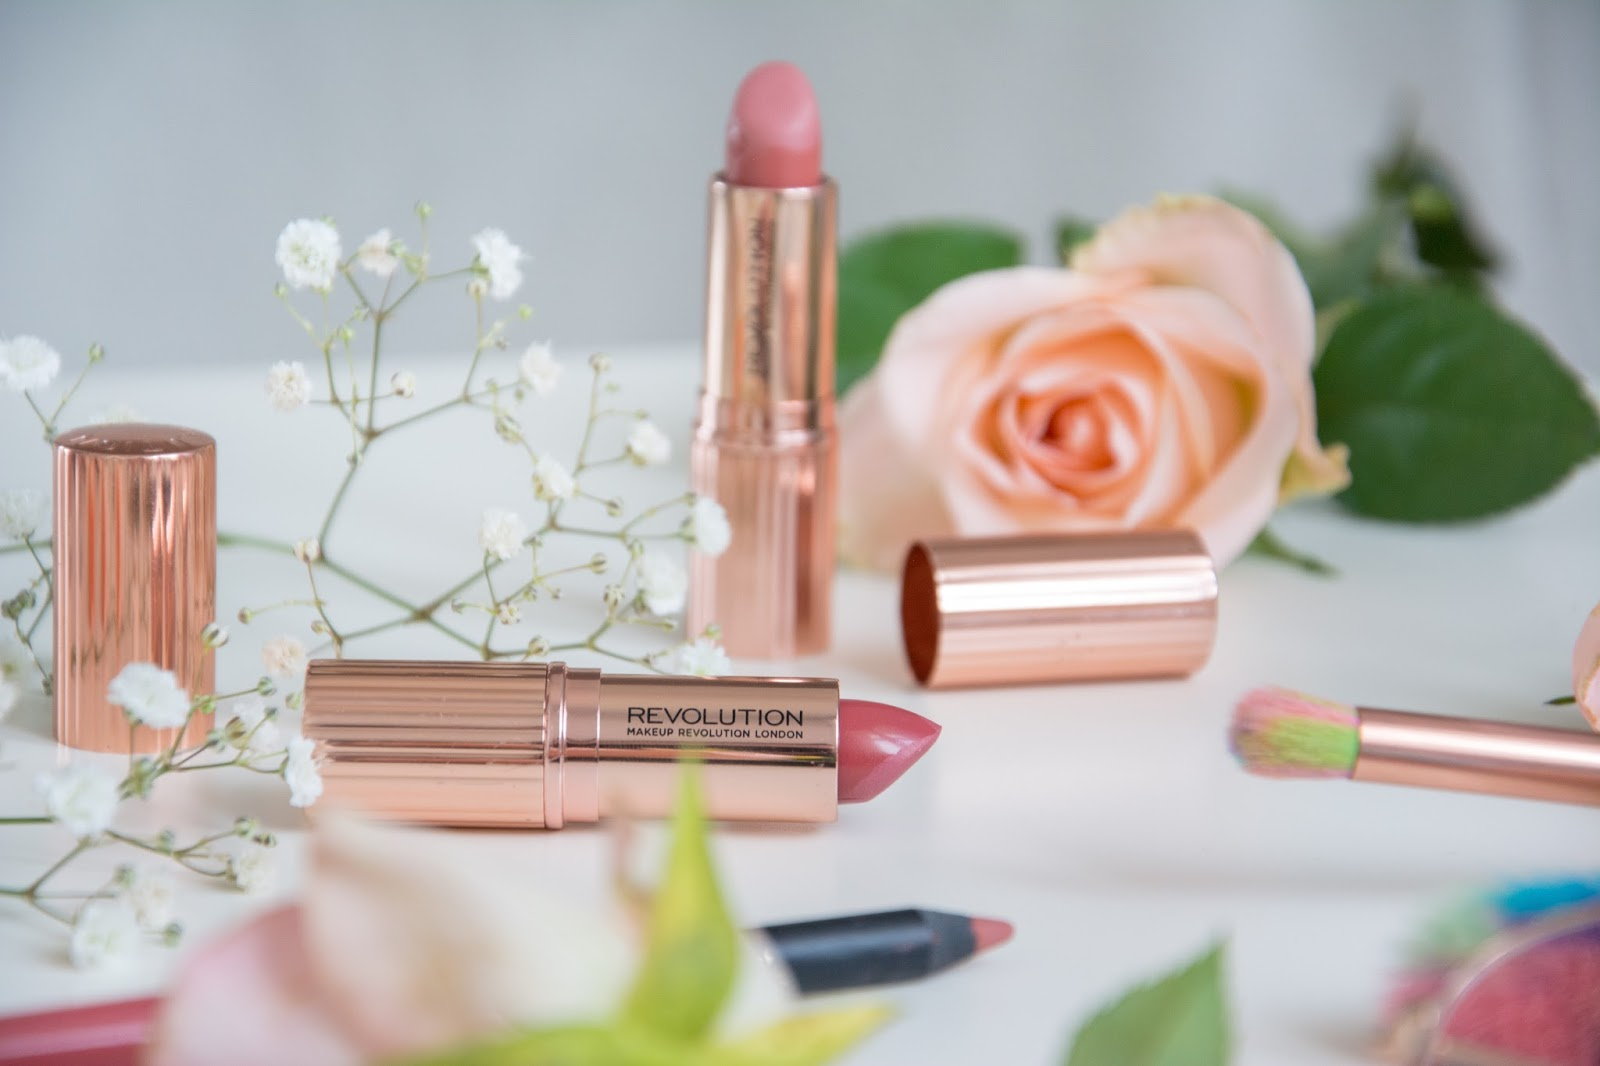 Makeup Revolution Renaissance Lipstick; Lahaye Unicorn Brushes; Primark Lipliner